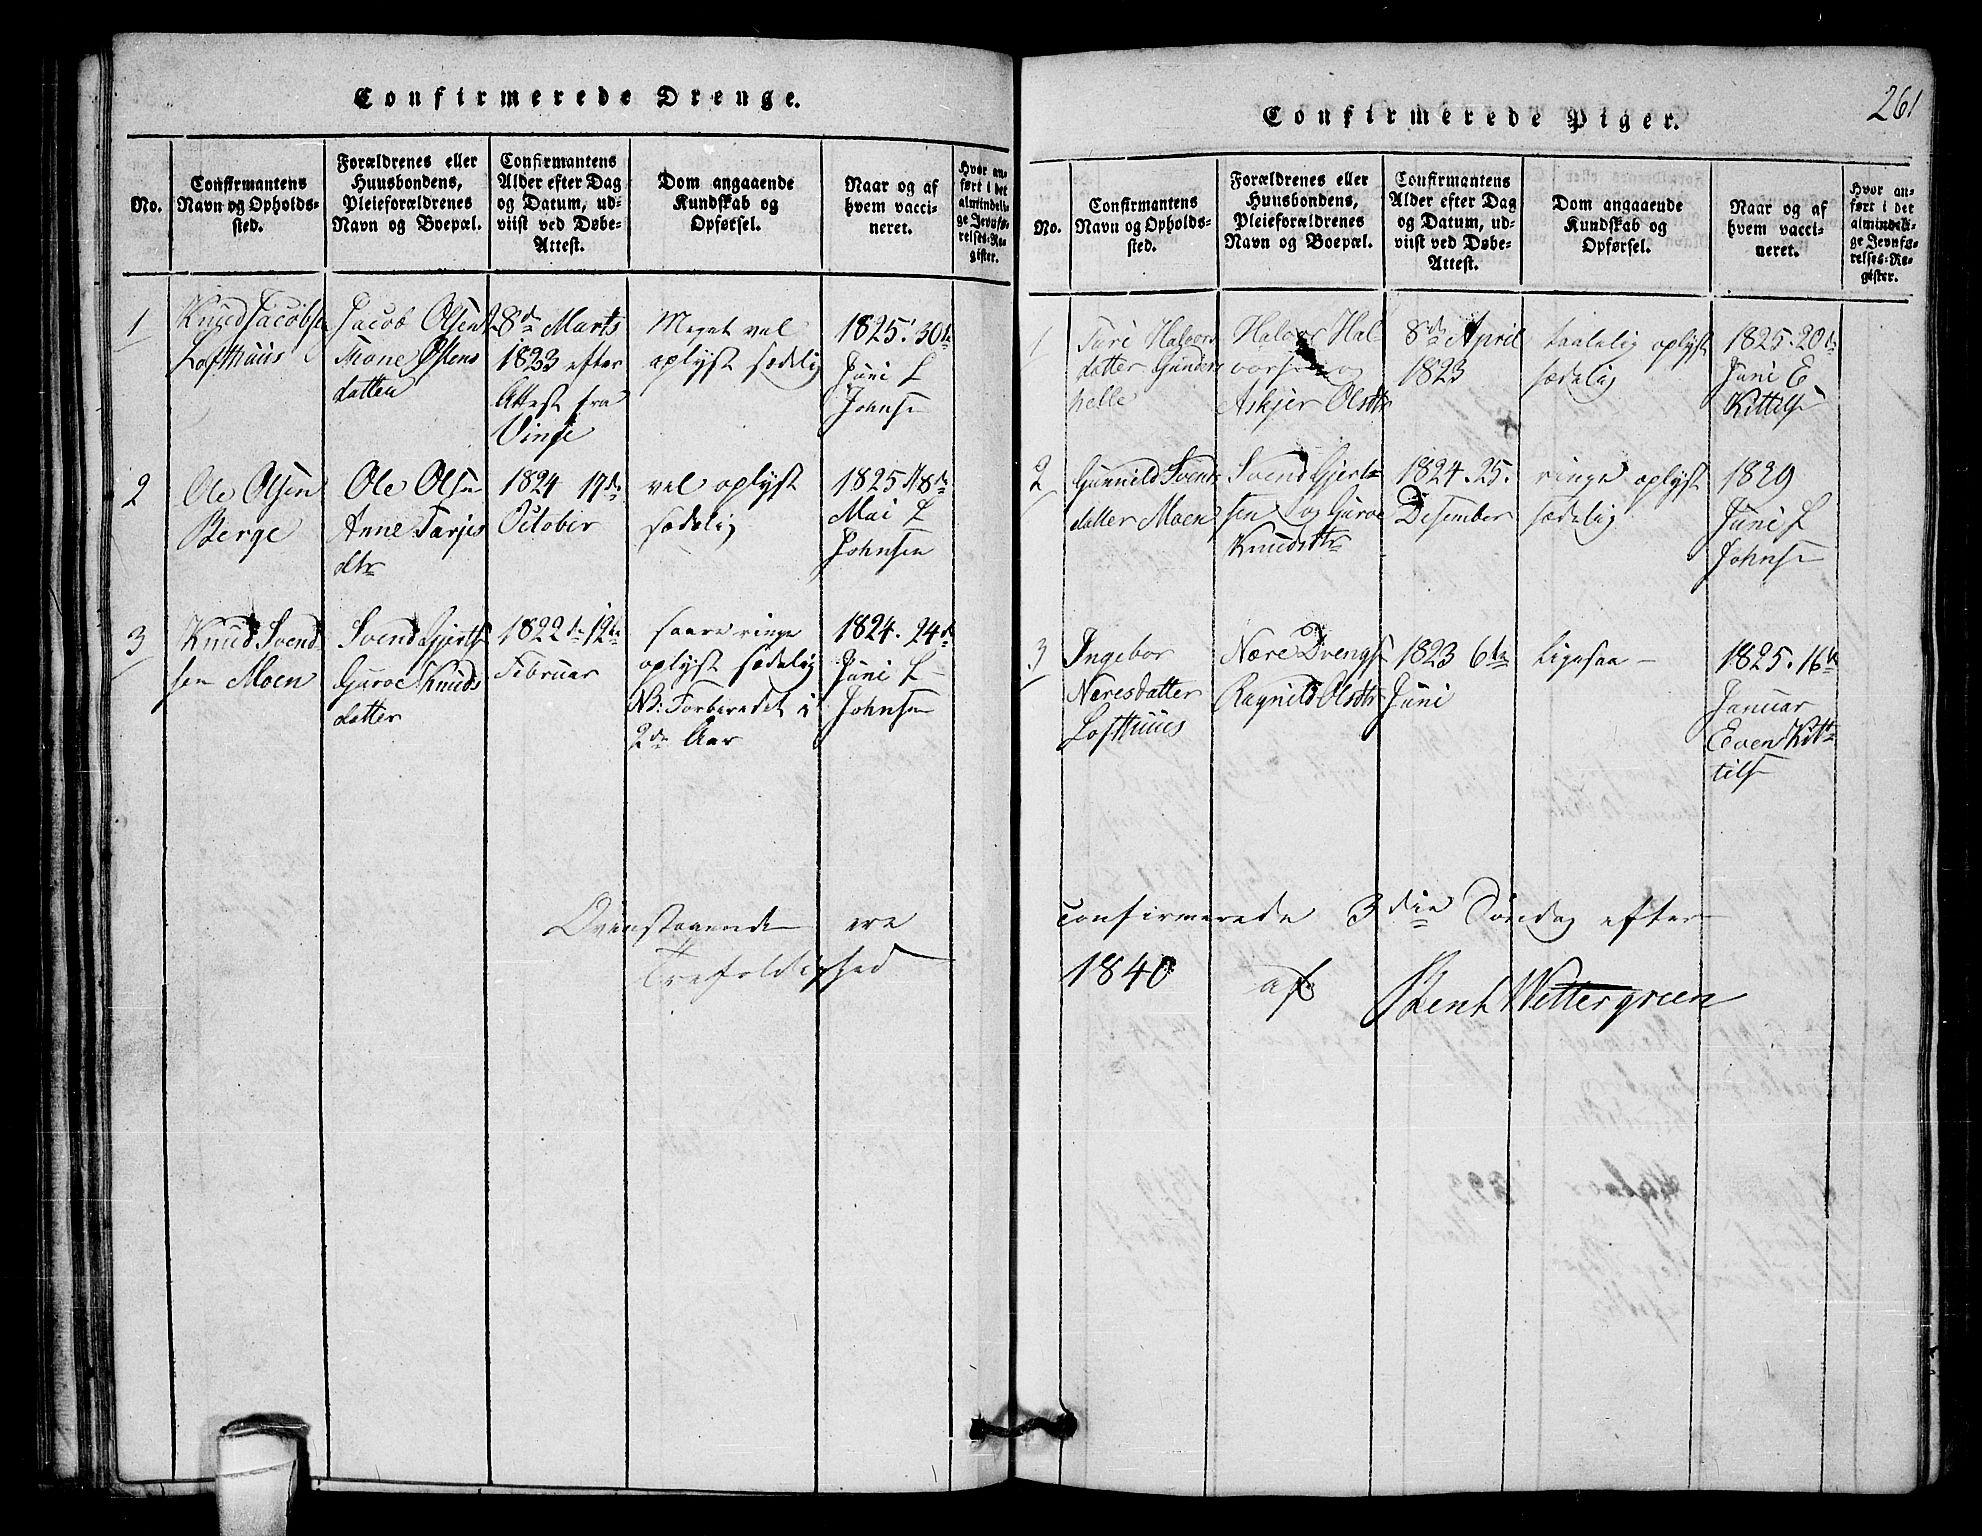 SAKO, Lårdal kirkebøker, G/Gb/L0001: Klokkerbok nr. II 1, 1815-1865, s. 261